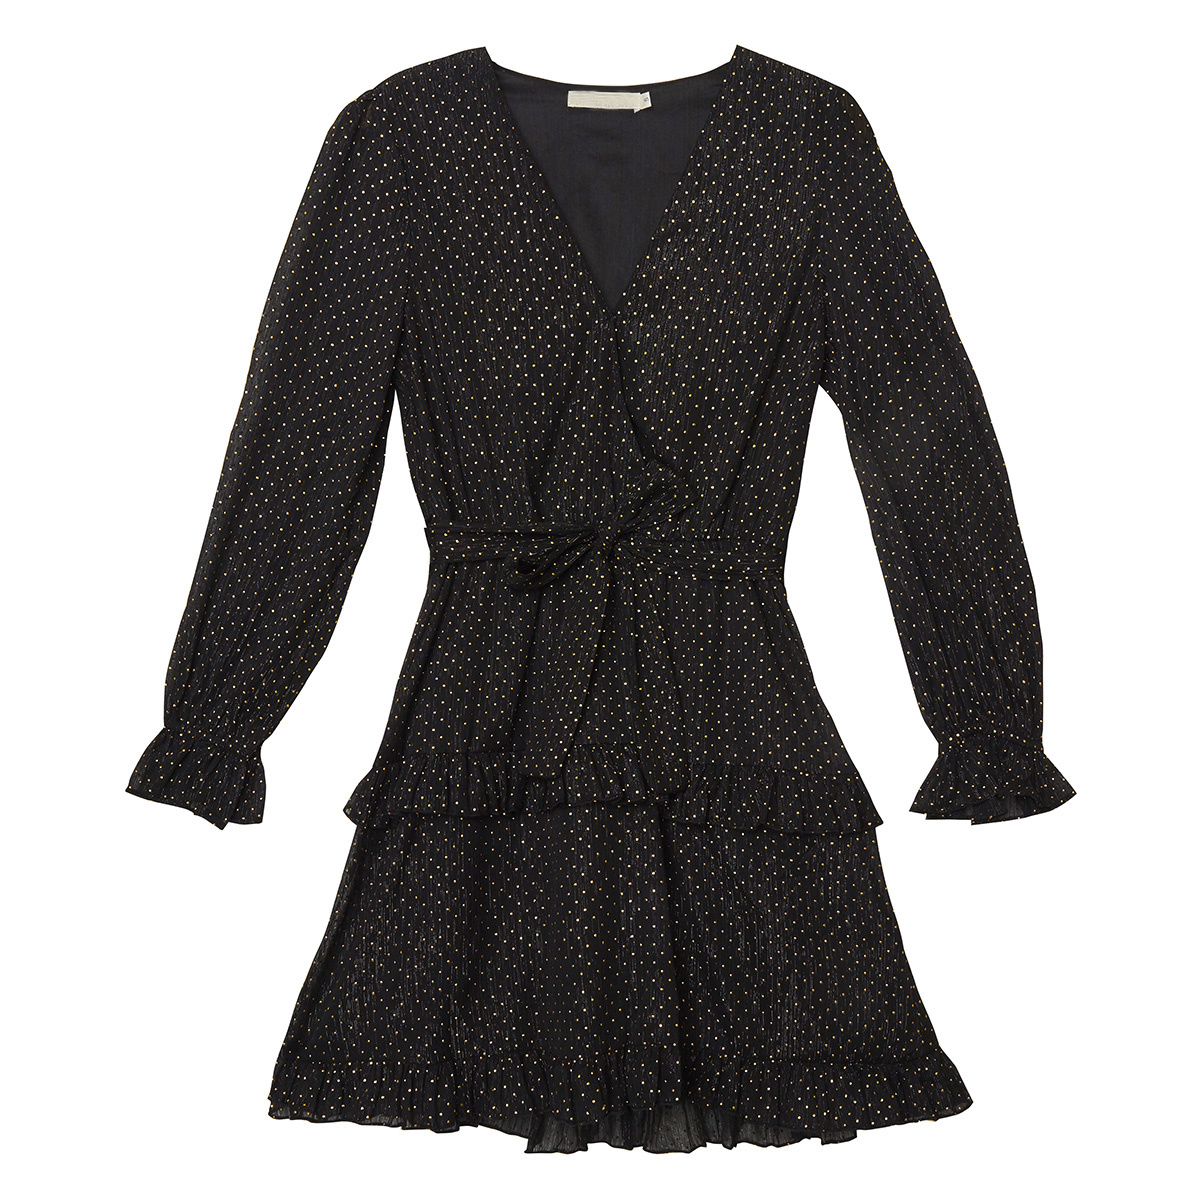 Joboly Dotted dress